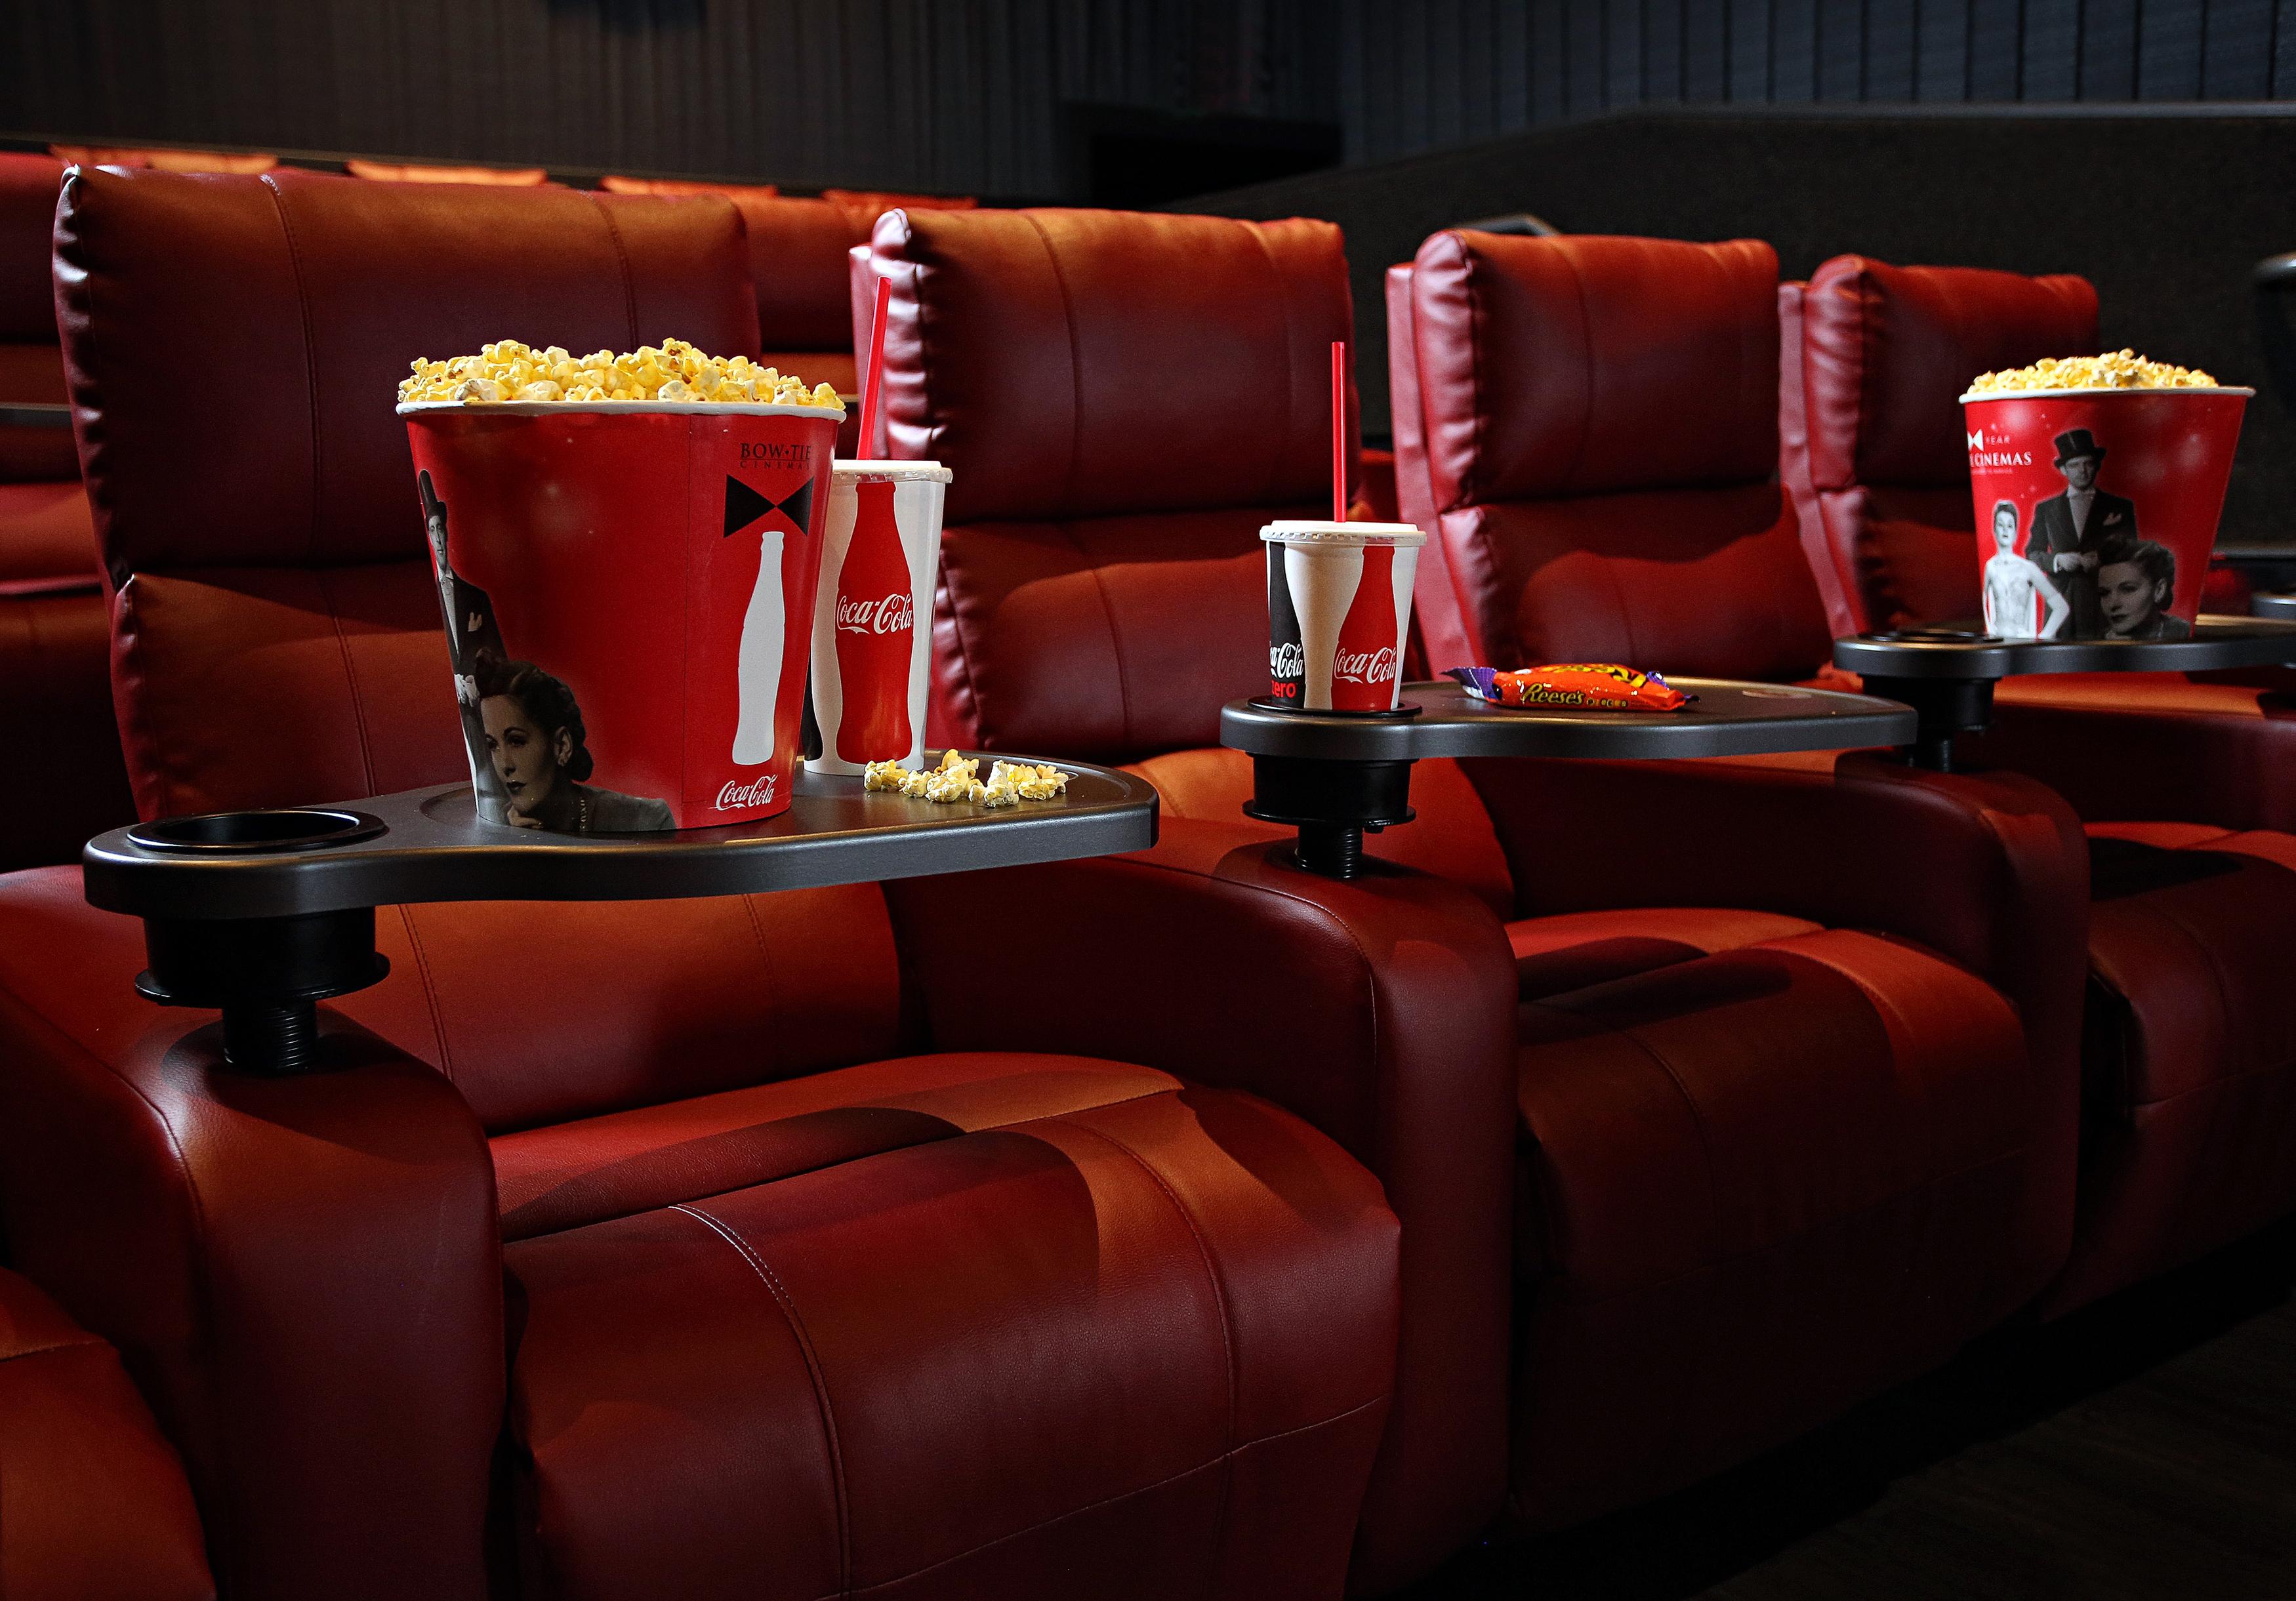 BowTie Cinemas Majestic Amazing Seating